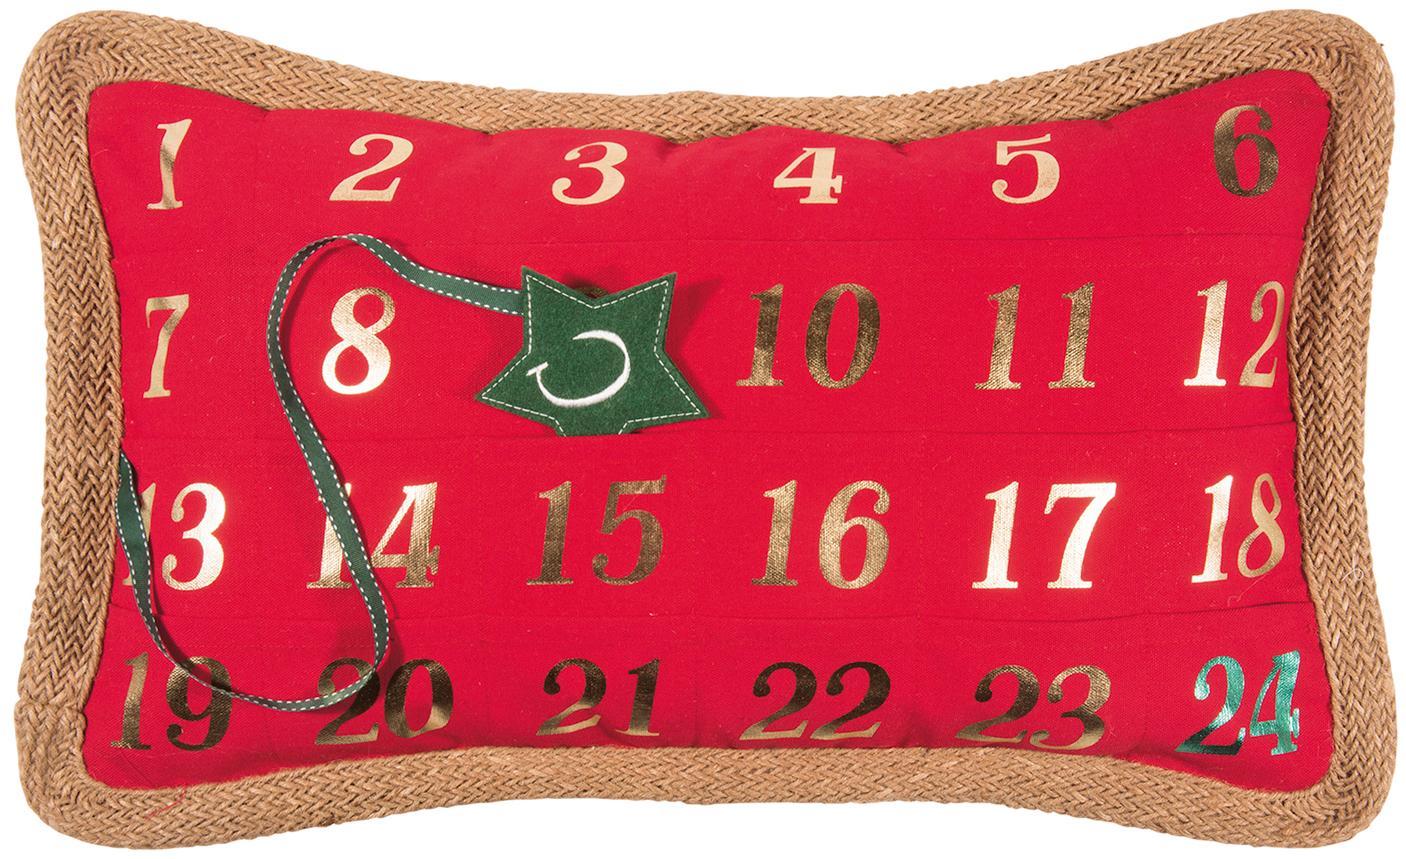 Federa arredo calendario dell'avvento Advent, 95% poliestere, 5% lino, Rosso, verde, Larg. 35 x Lung. 60 cm